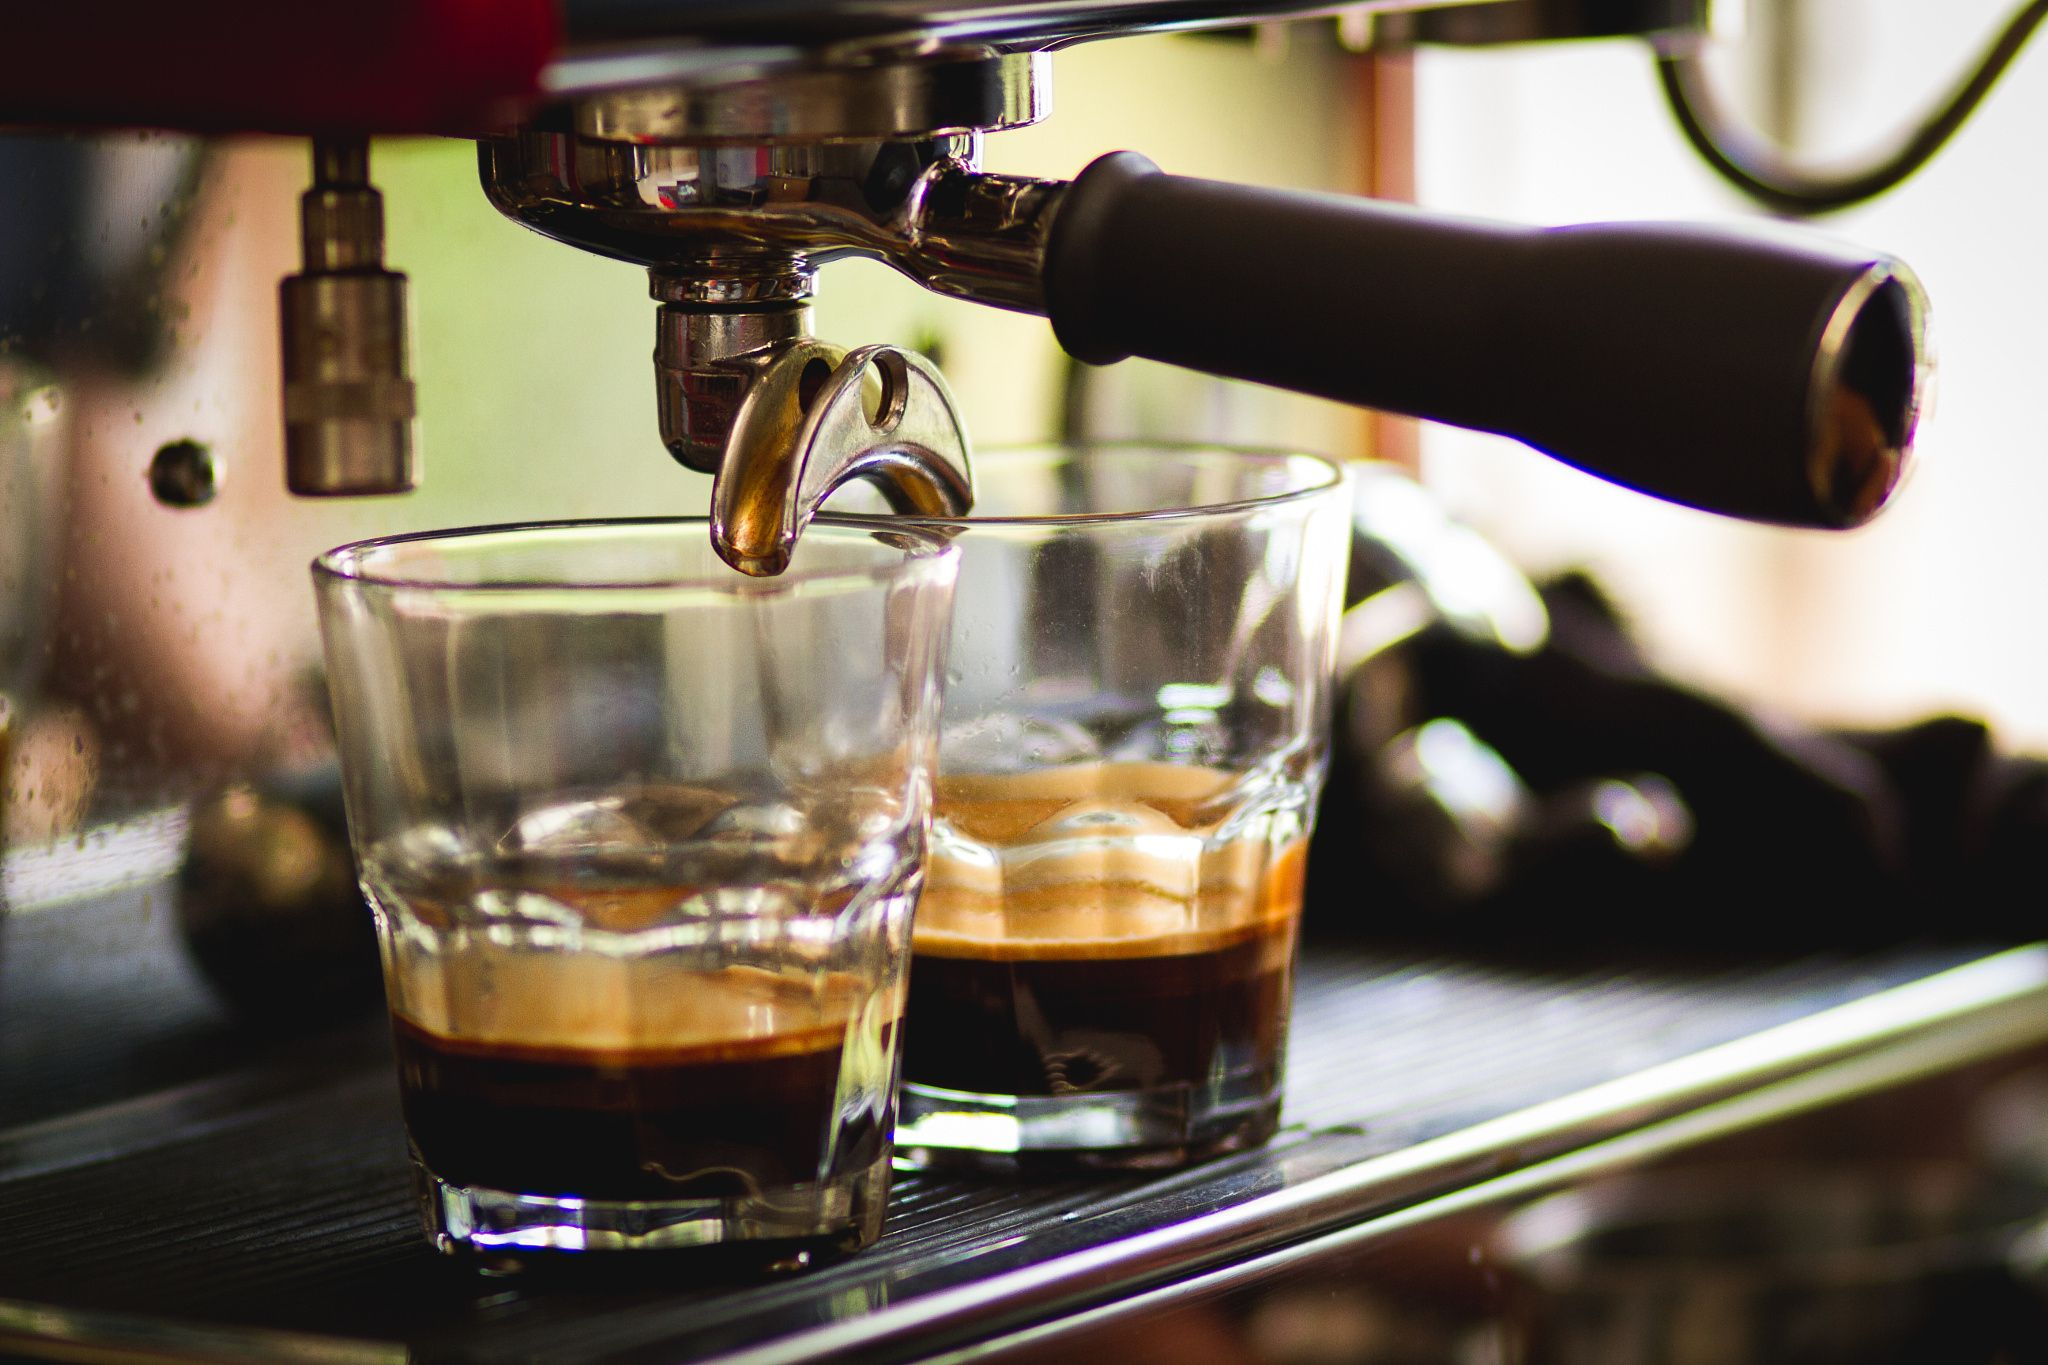 Maquina de espressos by Juan Pablo Muñoz Diaz on 500px